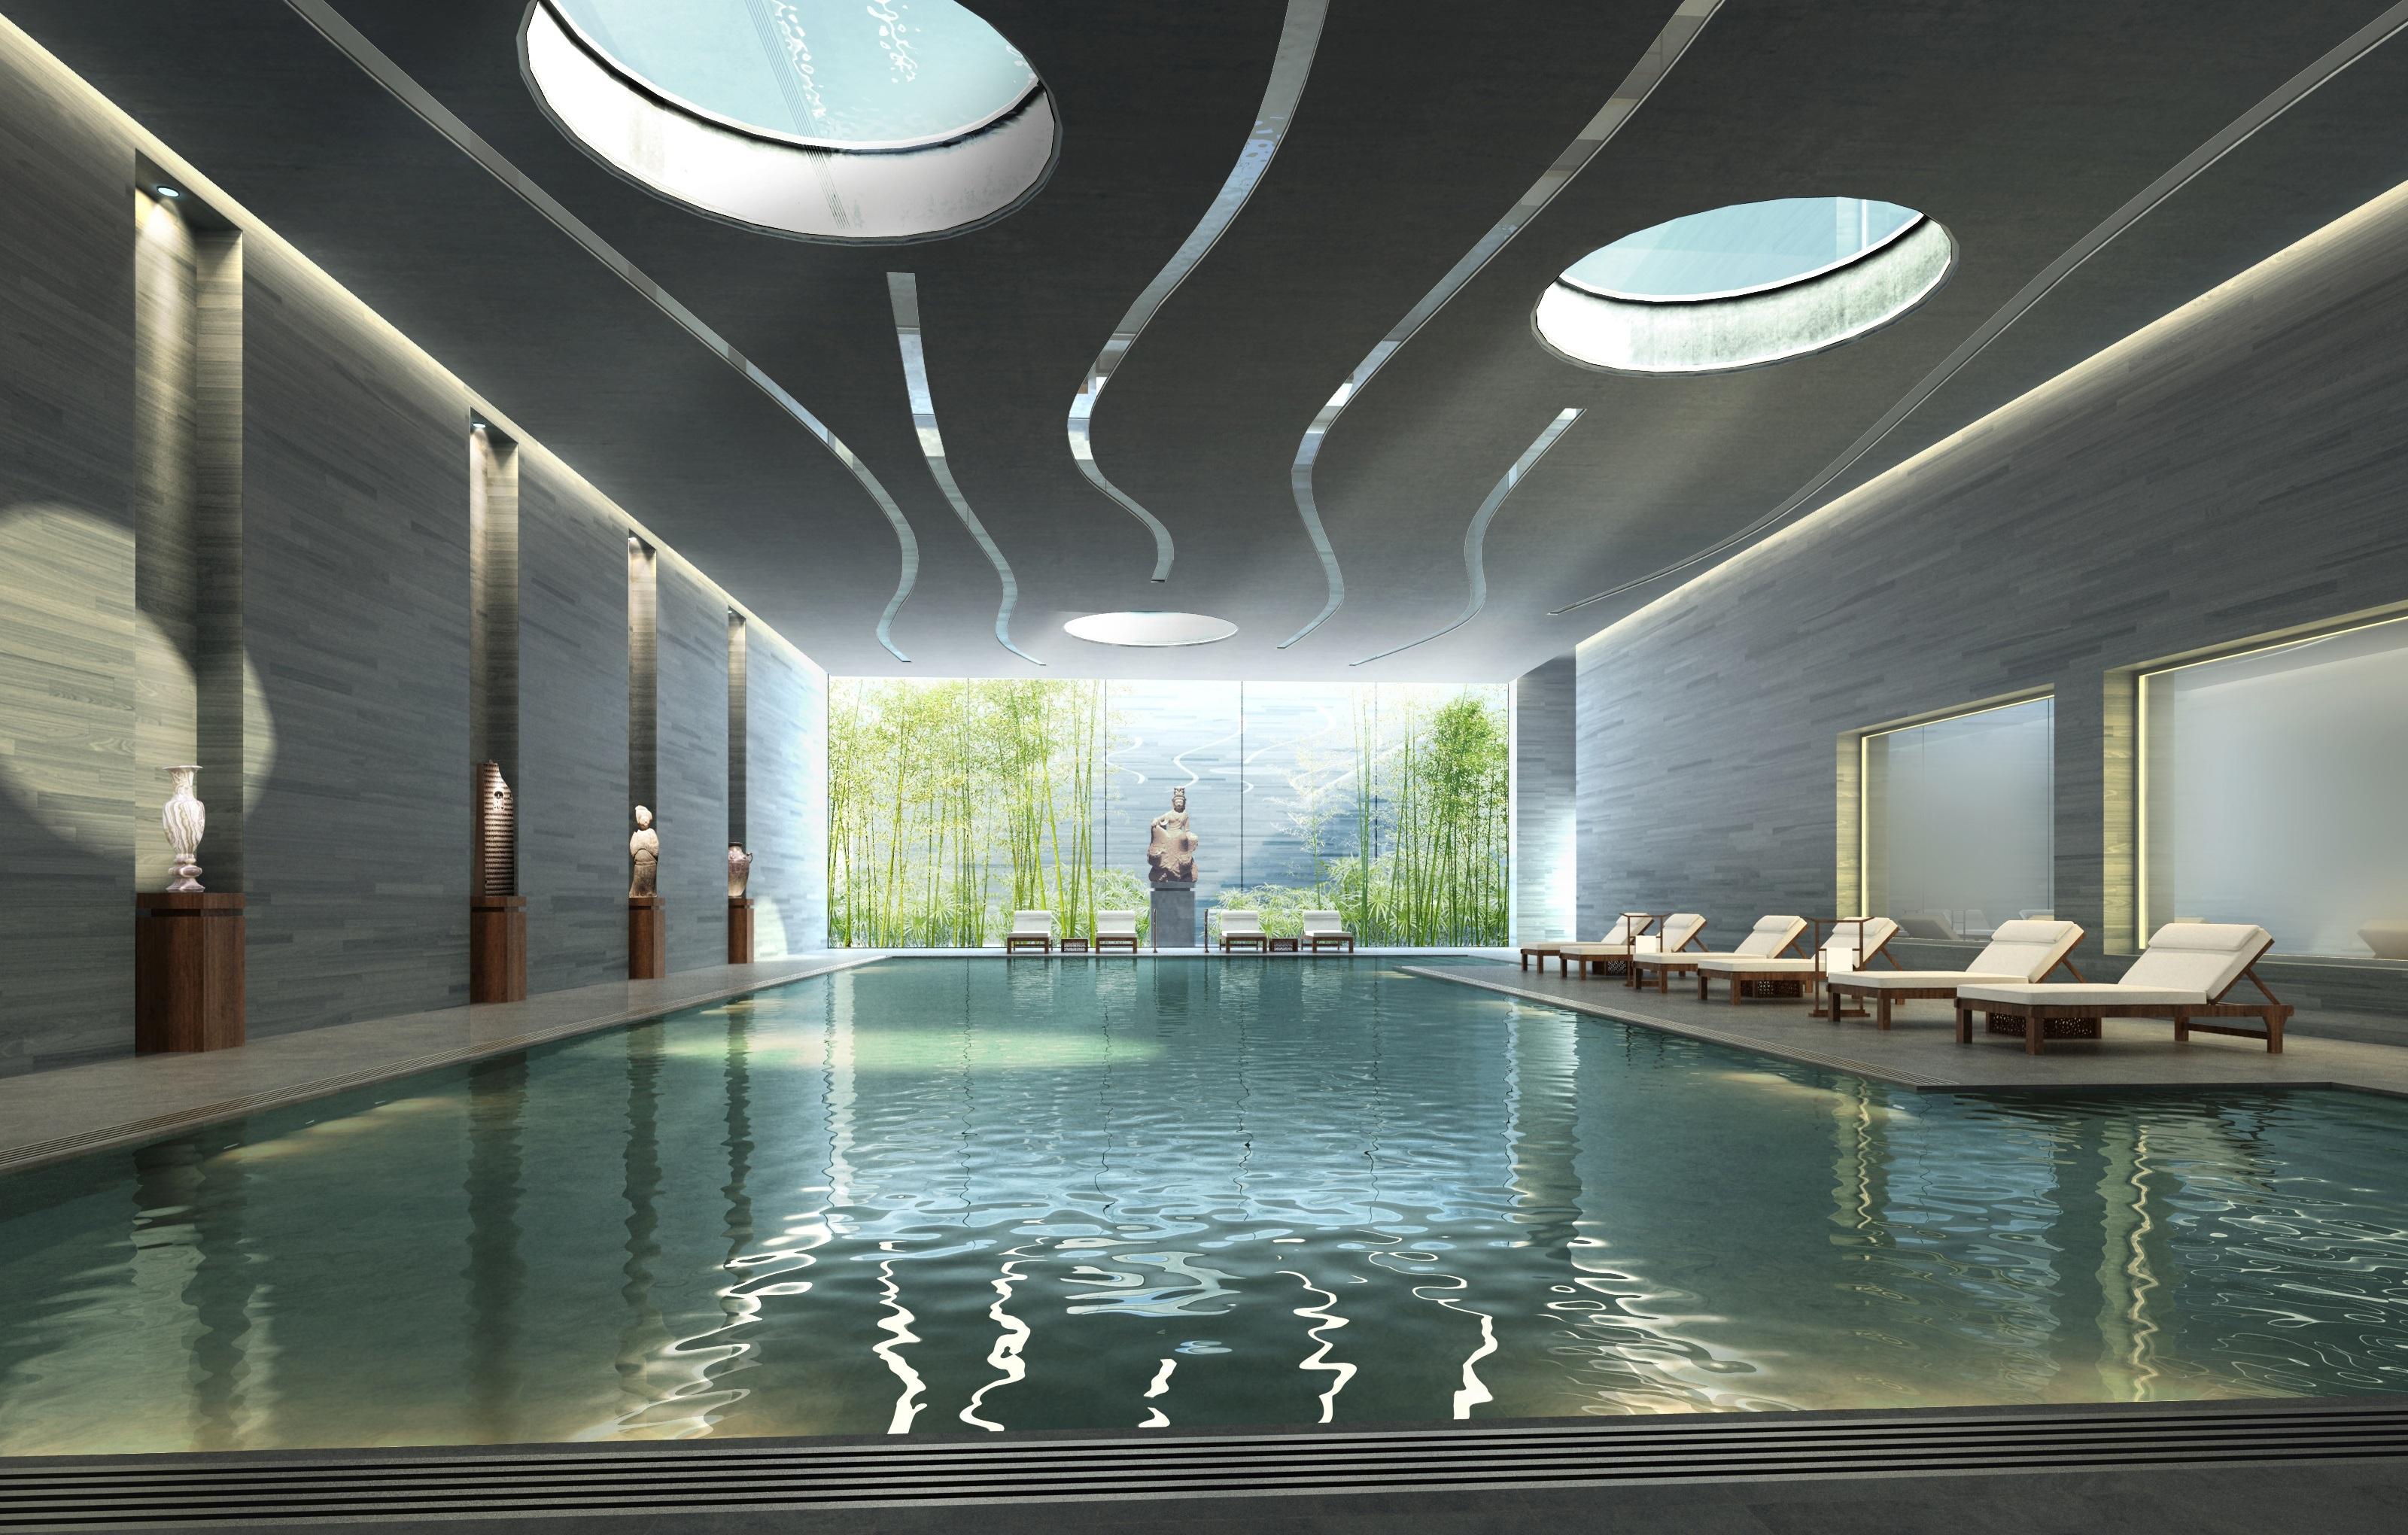 Superb Landscape Architecture Mansion Interior Building Swimming Pool Lighting  Interior Design Estate Visualization Cgi Rendering Visualization 3d